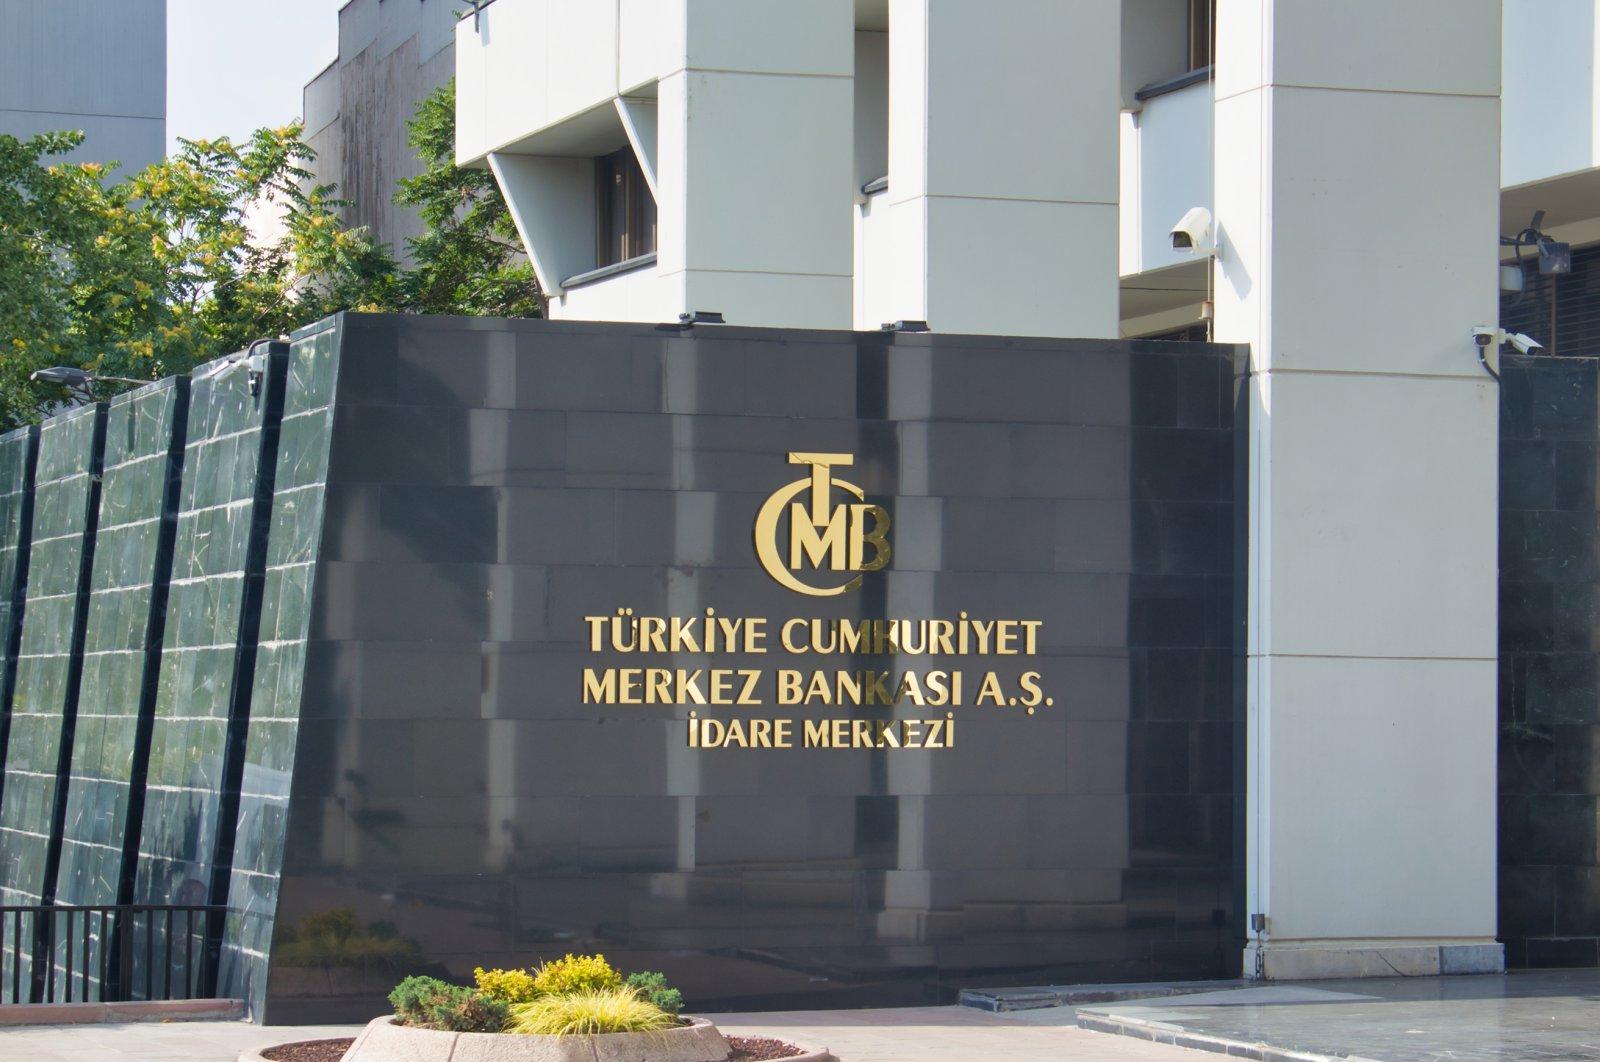 The Central Bank of the Republic of Turkey's (CBRT) branch in Izmir, western Turkey, Aug. 15, 2019. (Shutterstock Photo)